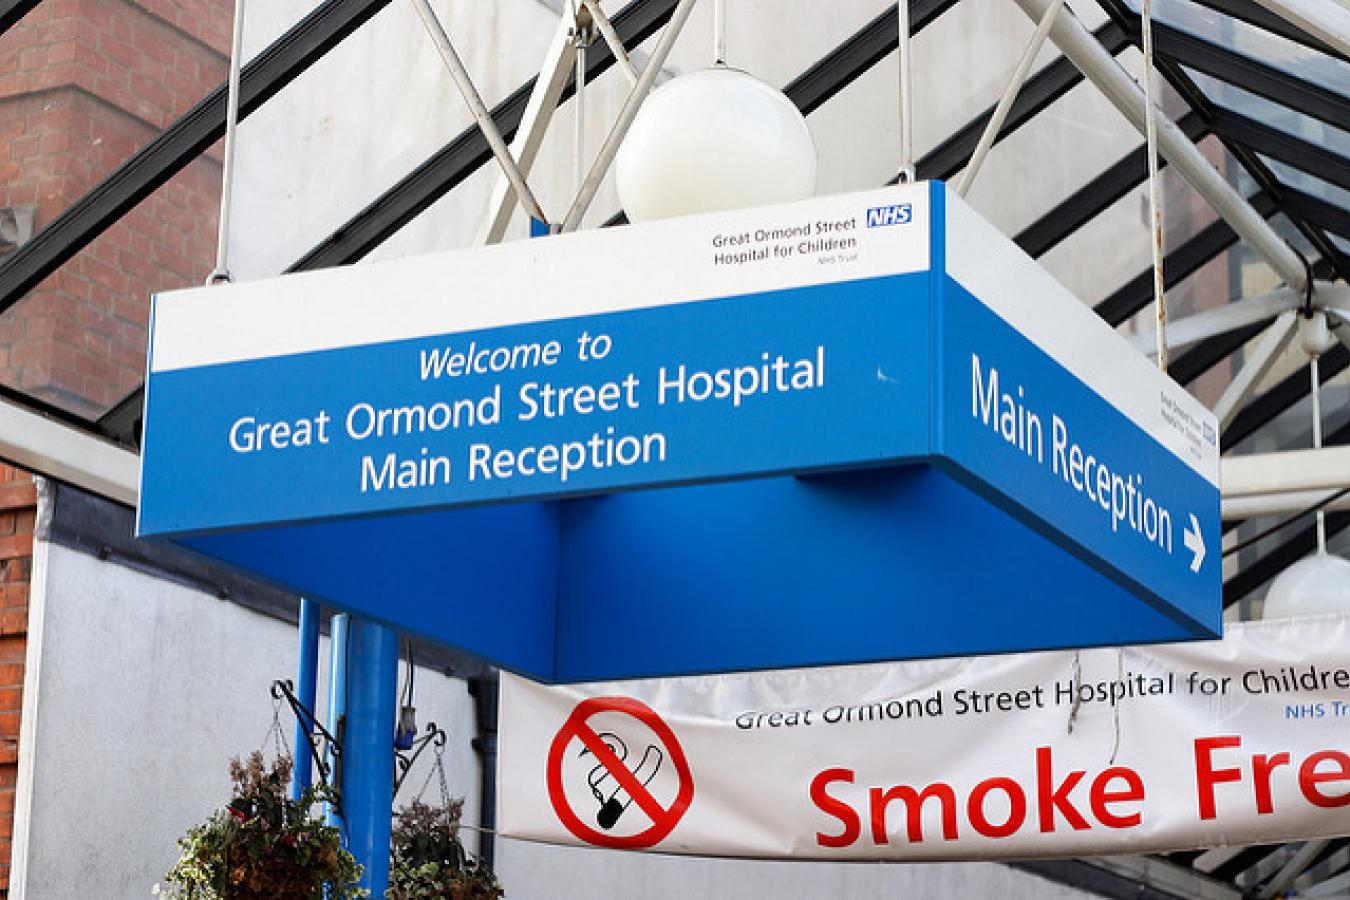 Tier 2 Visa Shortage affecting Hospitals